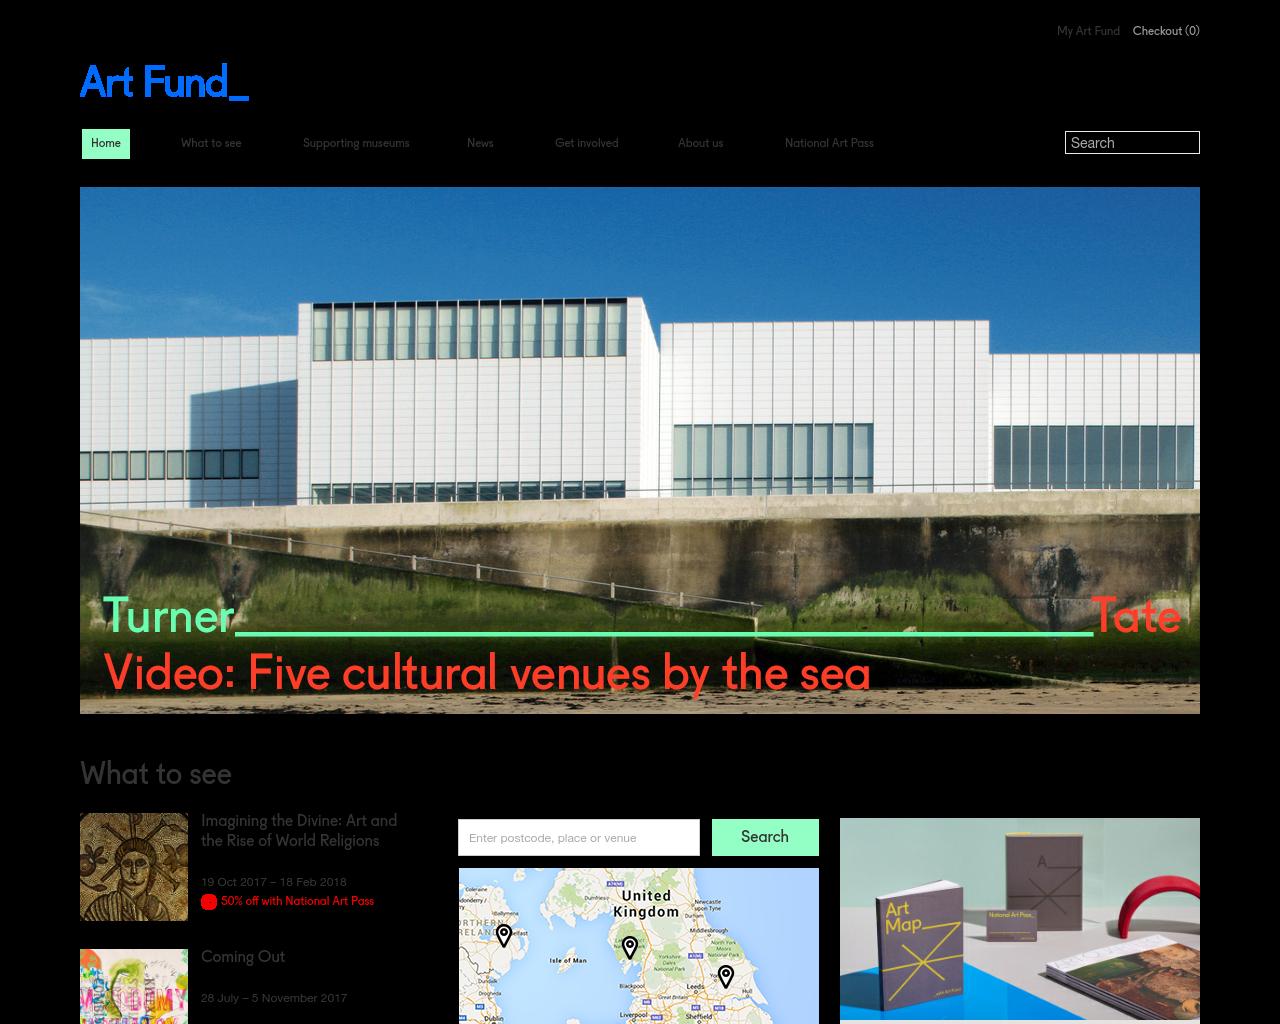 ArtFund-Advertising-Reviews-Pricing